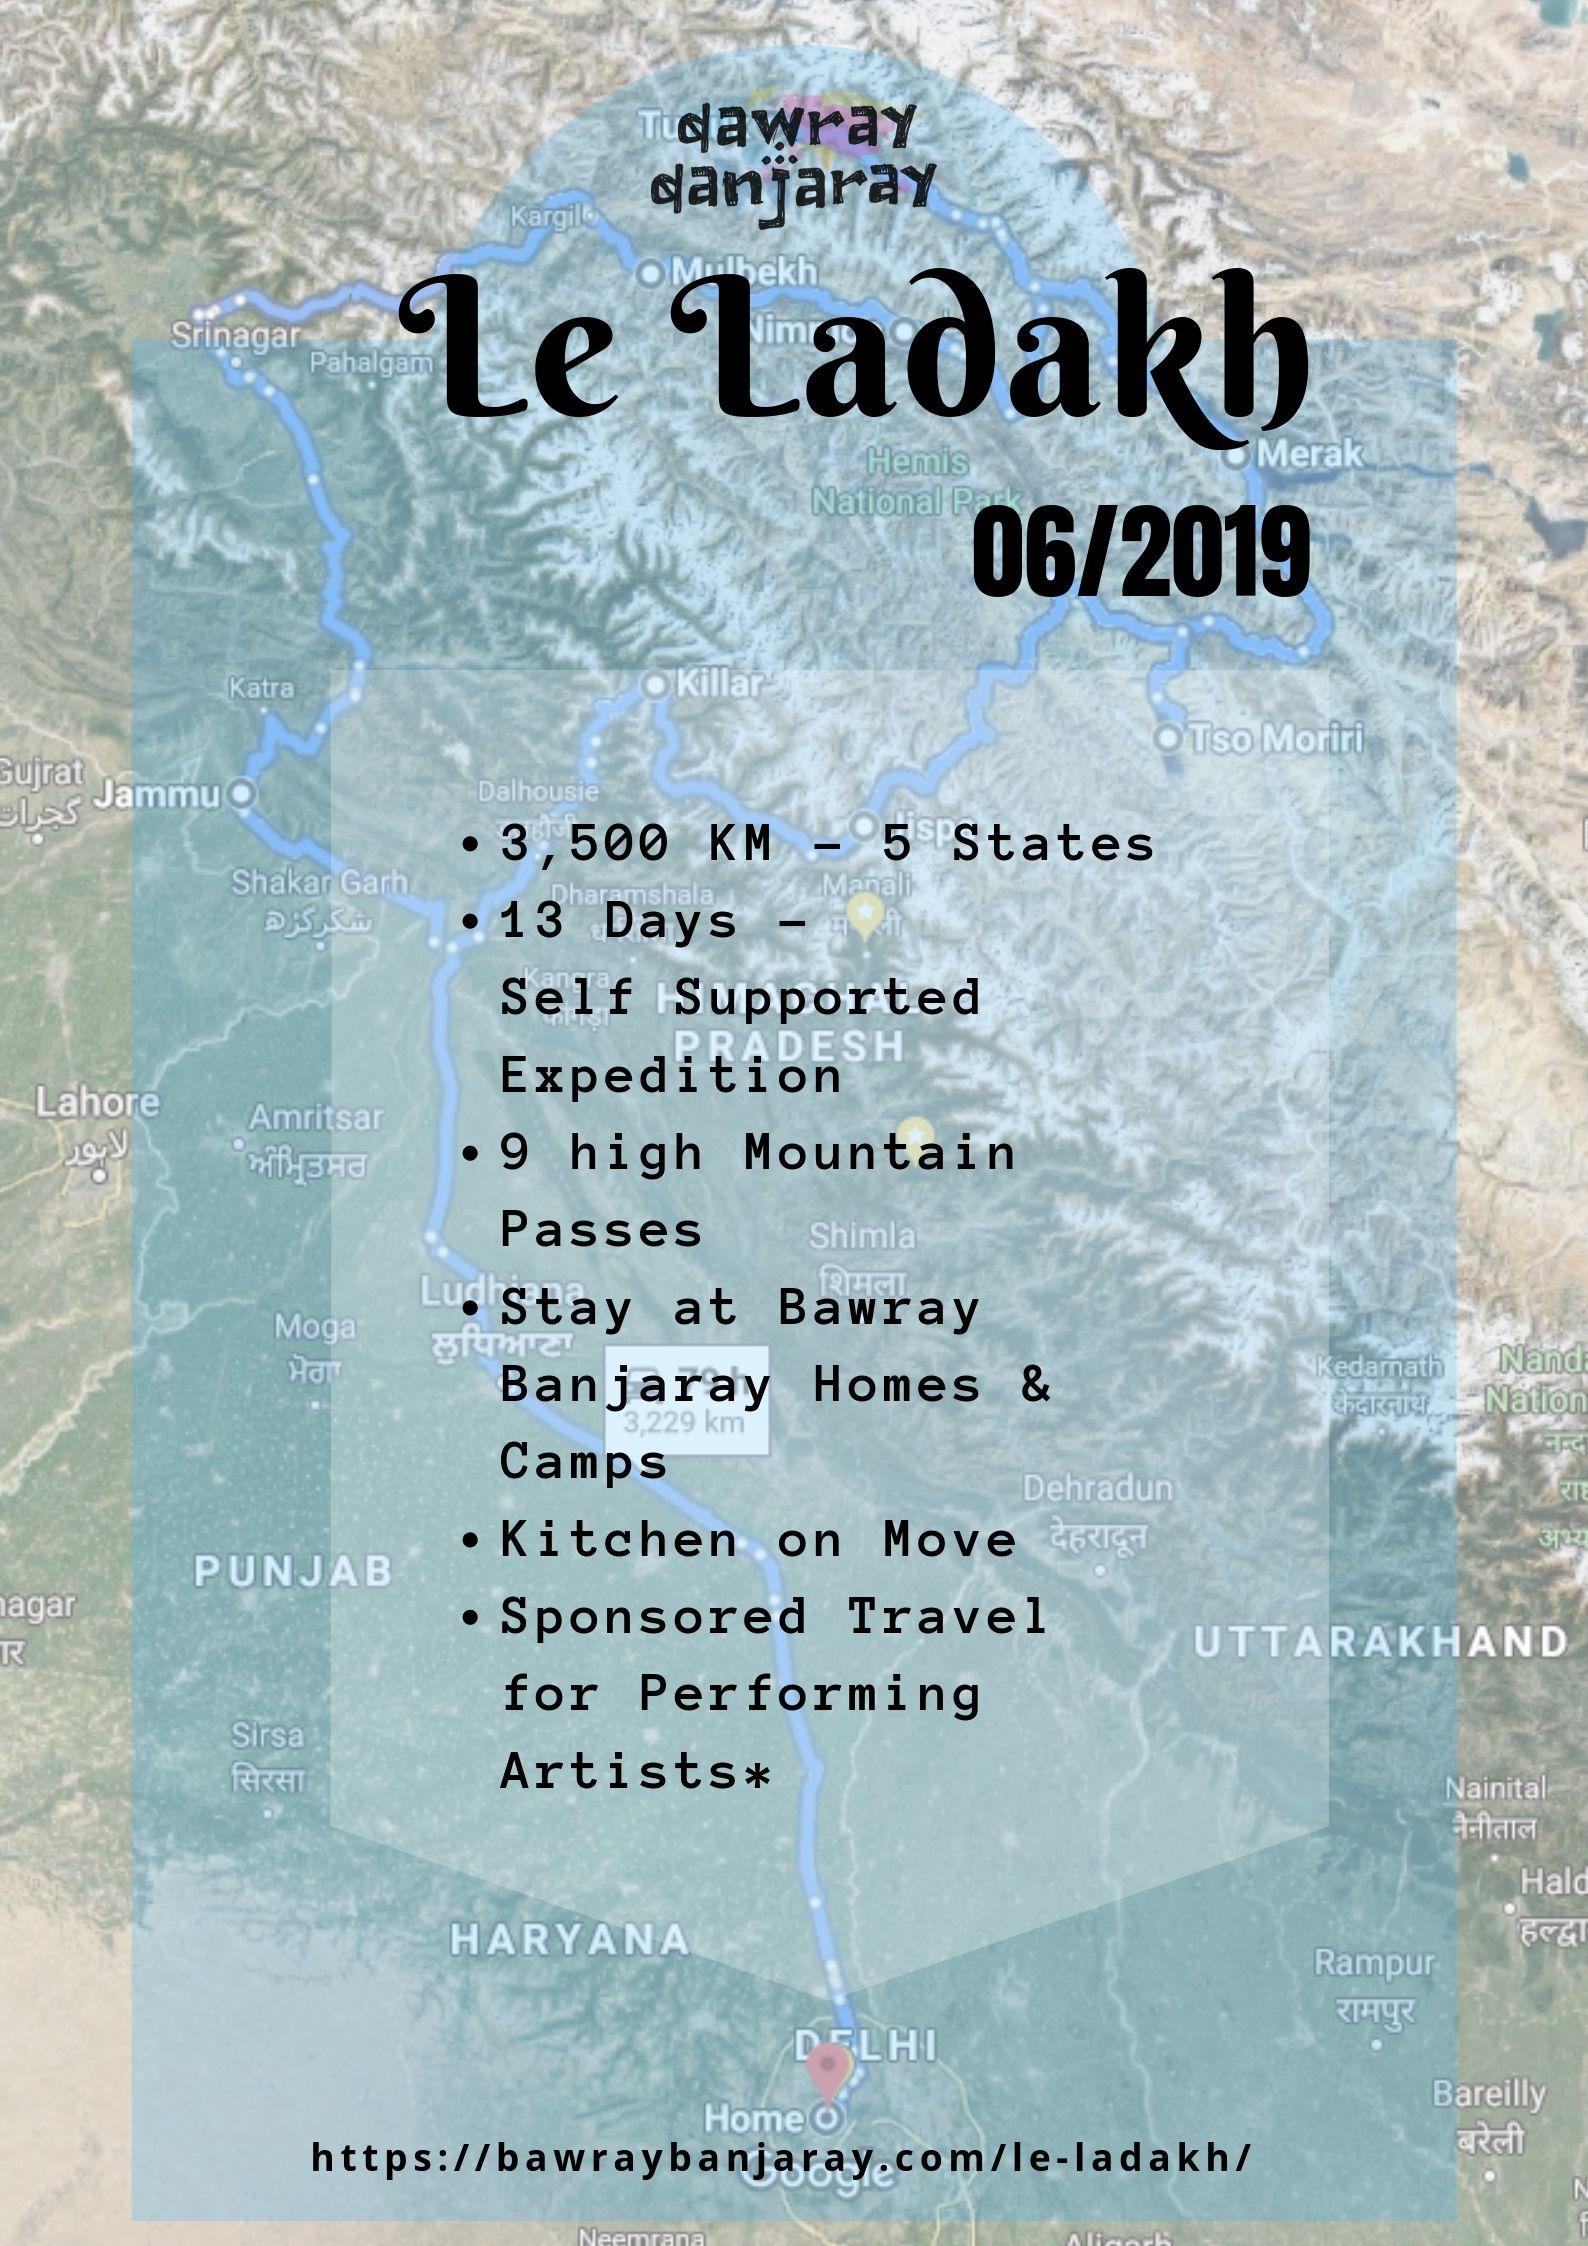 Bawray Banjaray expedition to Ladakh